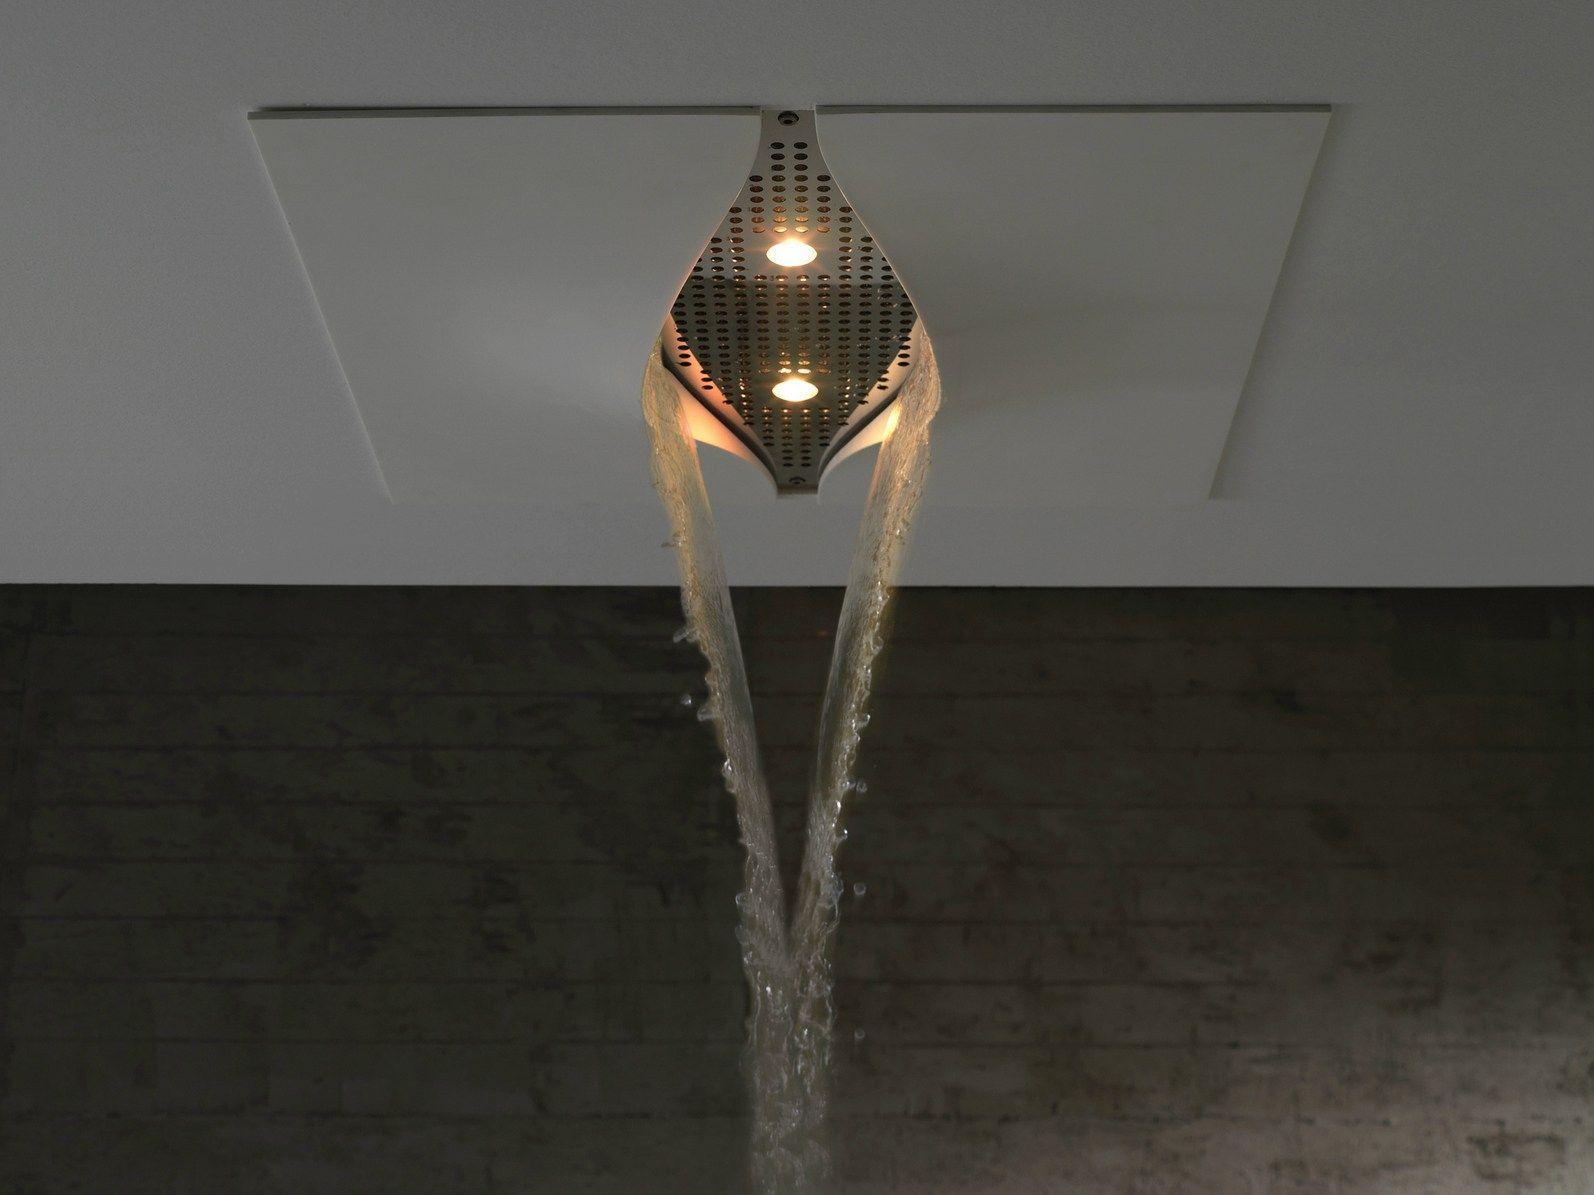 t te de douche effet pluie avec clairage int gr virgin by zazzeri design daniele bedini. Black Bedroom Furniture Sets. Home Design Ideas